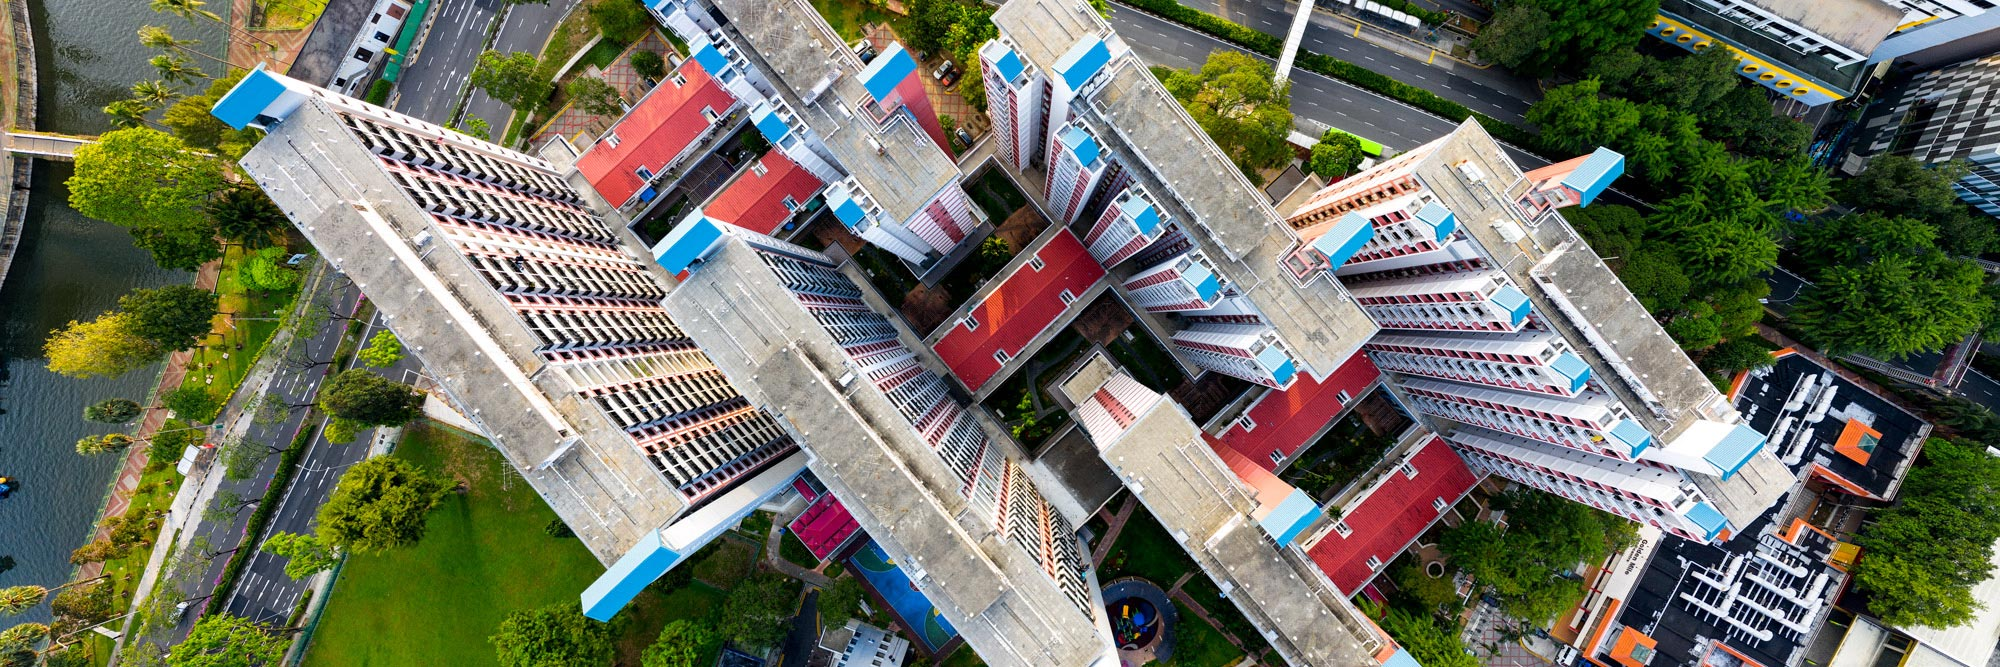 Singapore HDB aerial